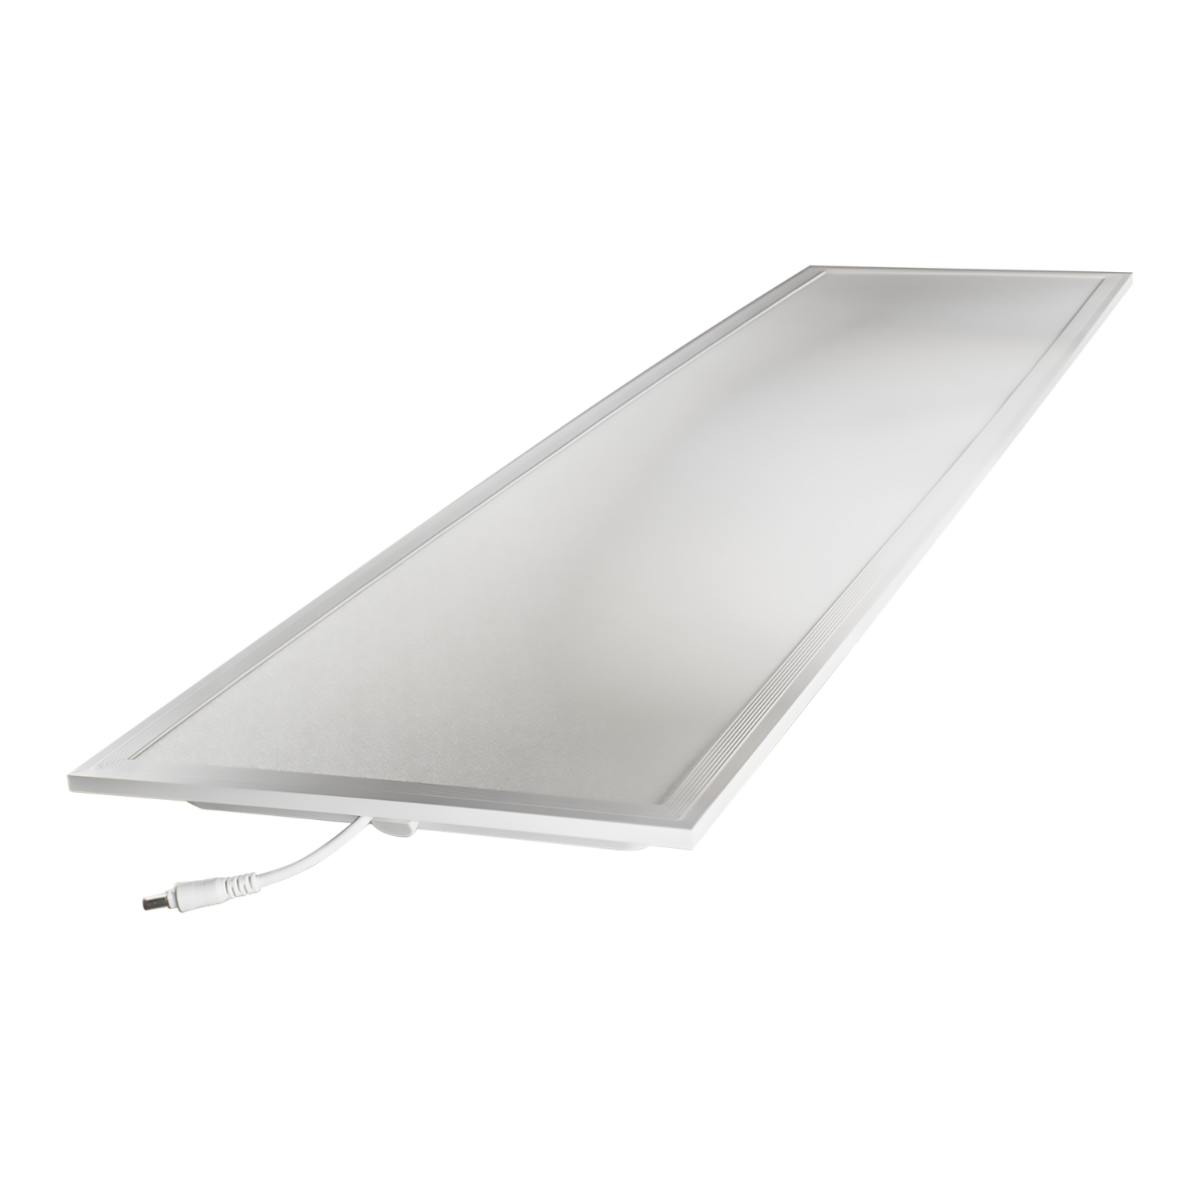 Noxion LED Paneeli Delta Pro V2.0 Xitanium DALI 30W 30x120cm 4000K 4110lm UGR <19 | Dali Himmennettävä - Kylmä Valkoinen - Korvaa 2x36W